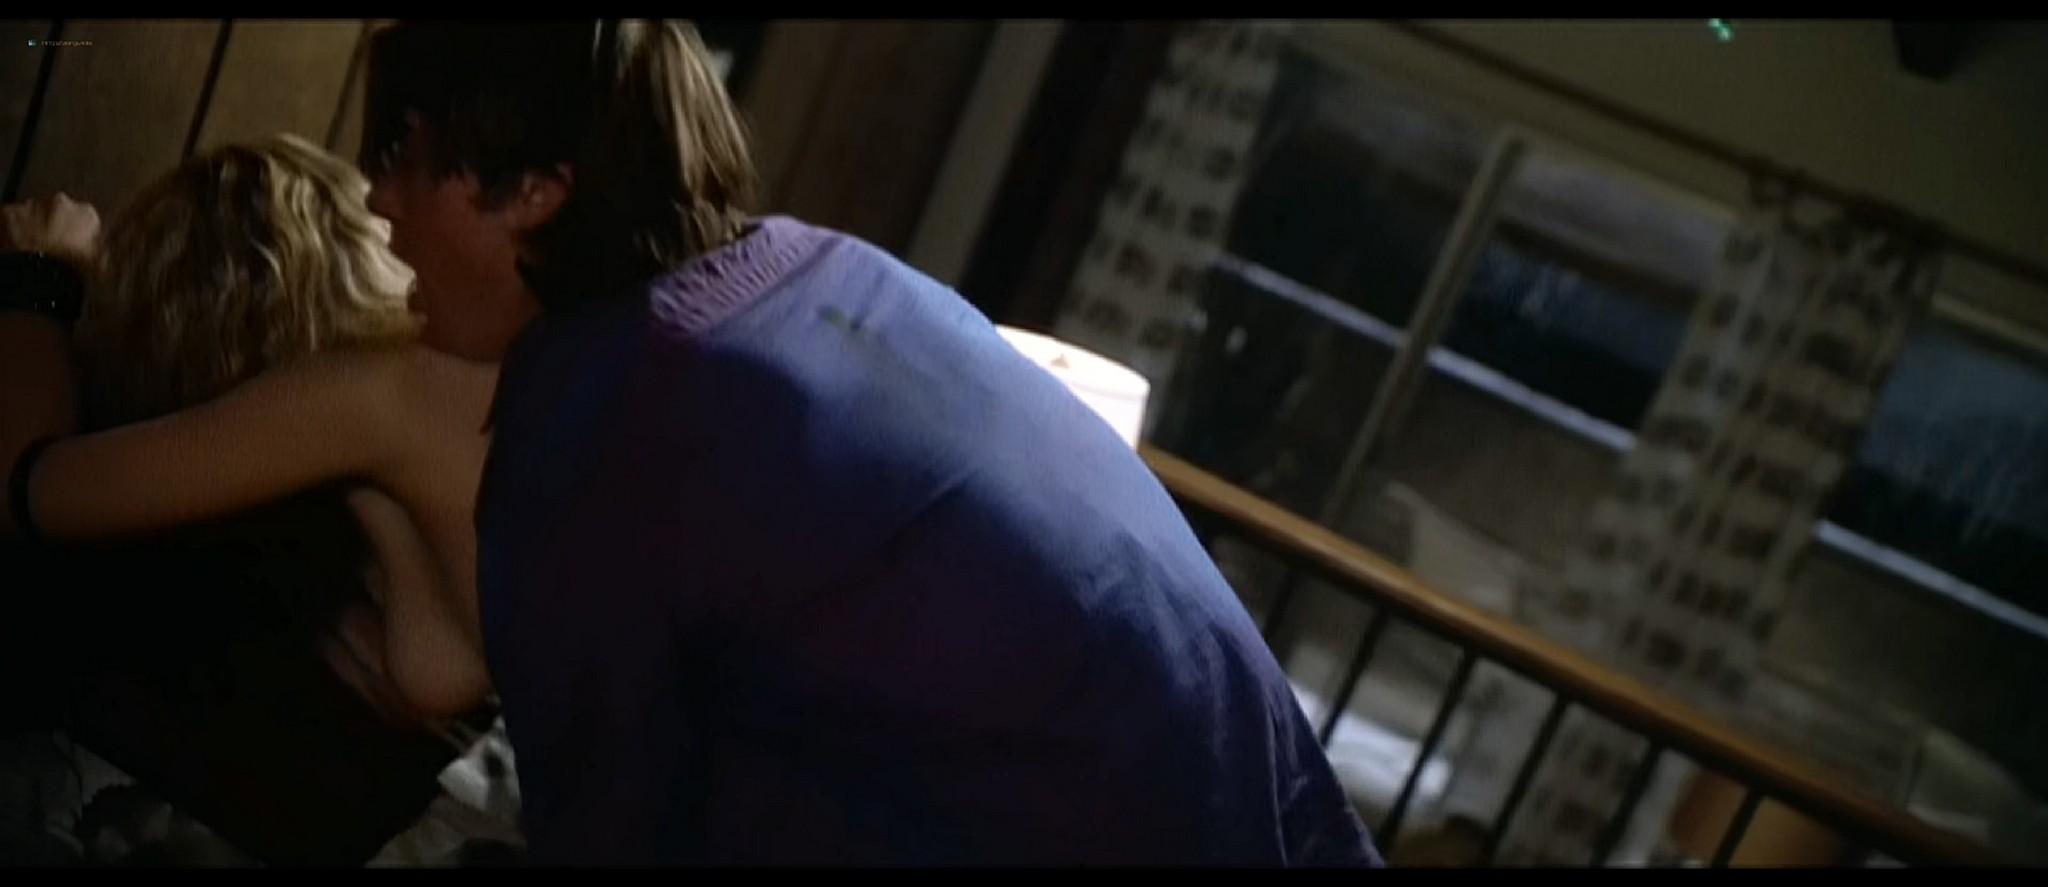 Tara Reid nude hot sex and Emily Procter nude body double - Body Shots (1999) HD 1080p Web (4)